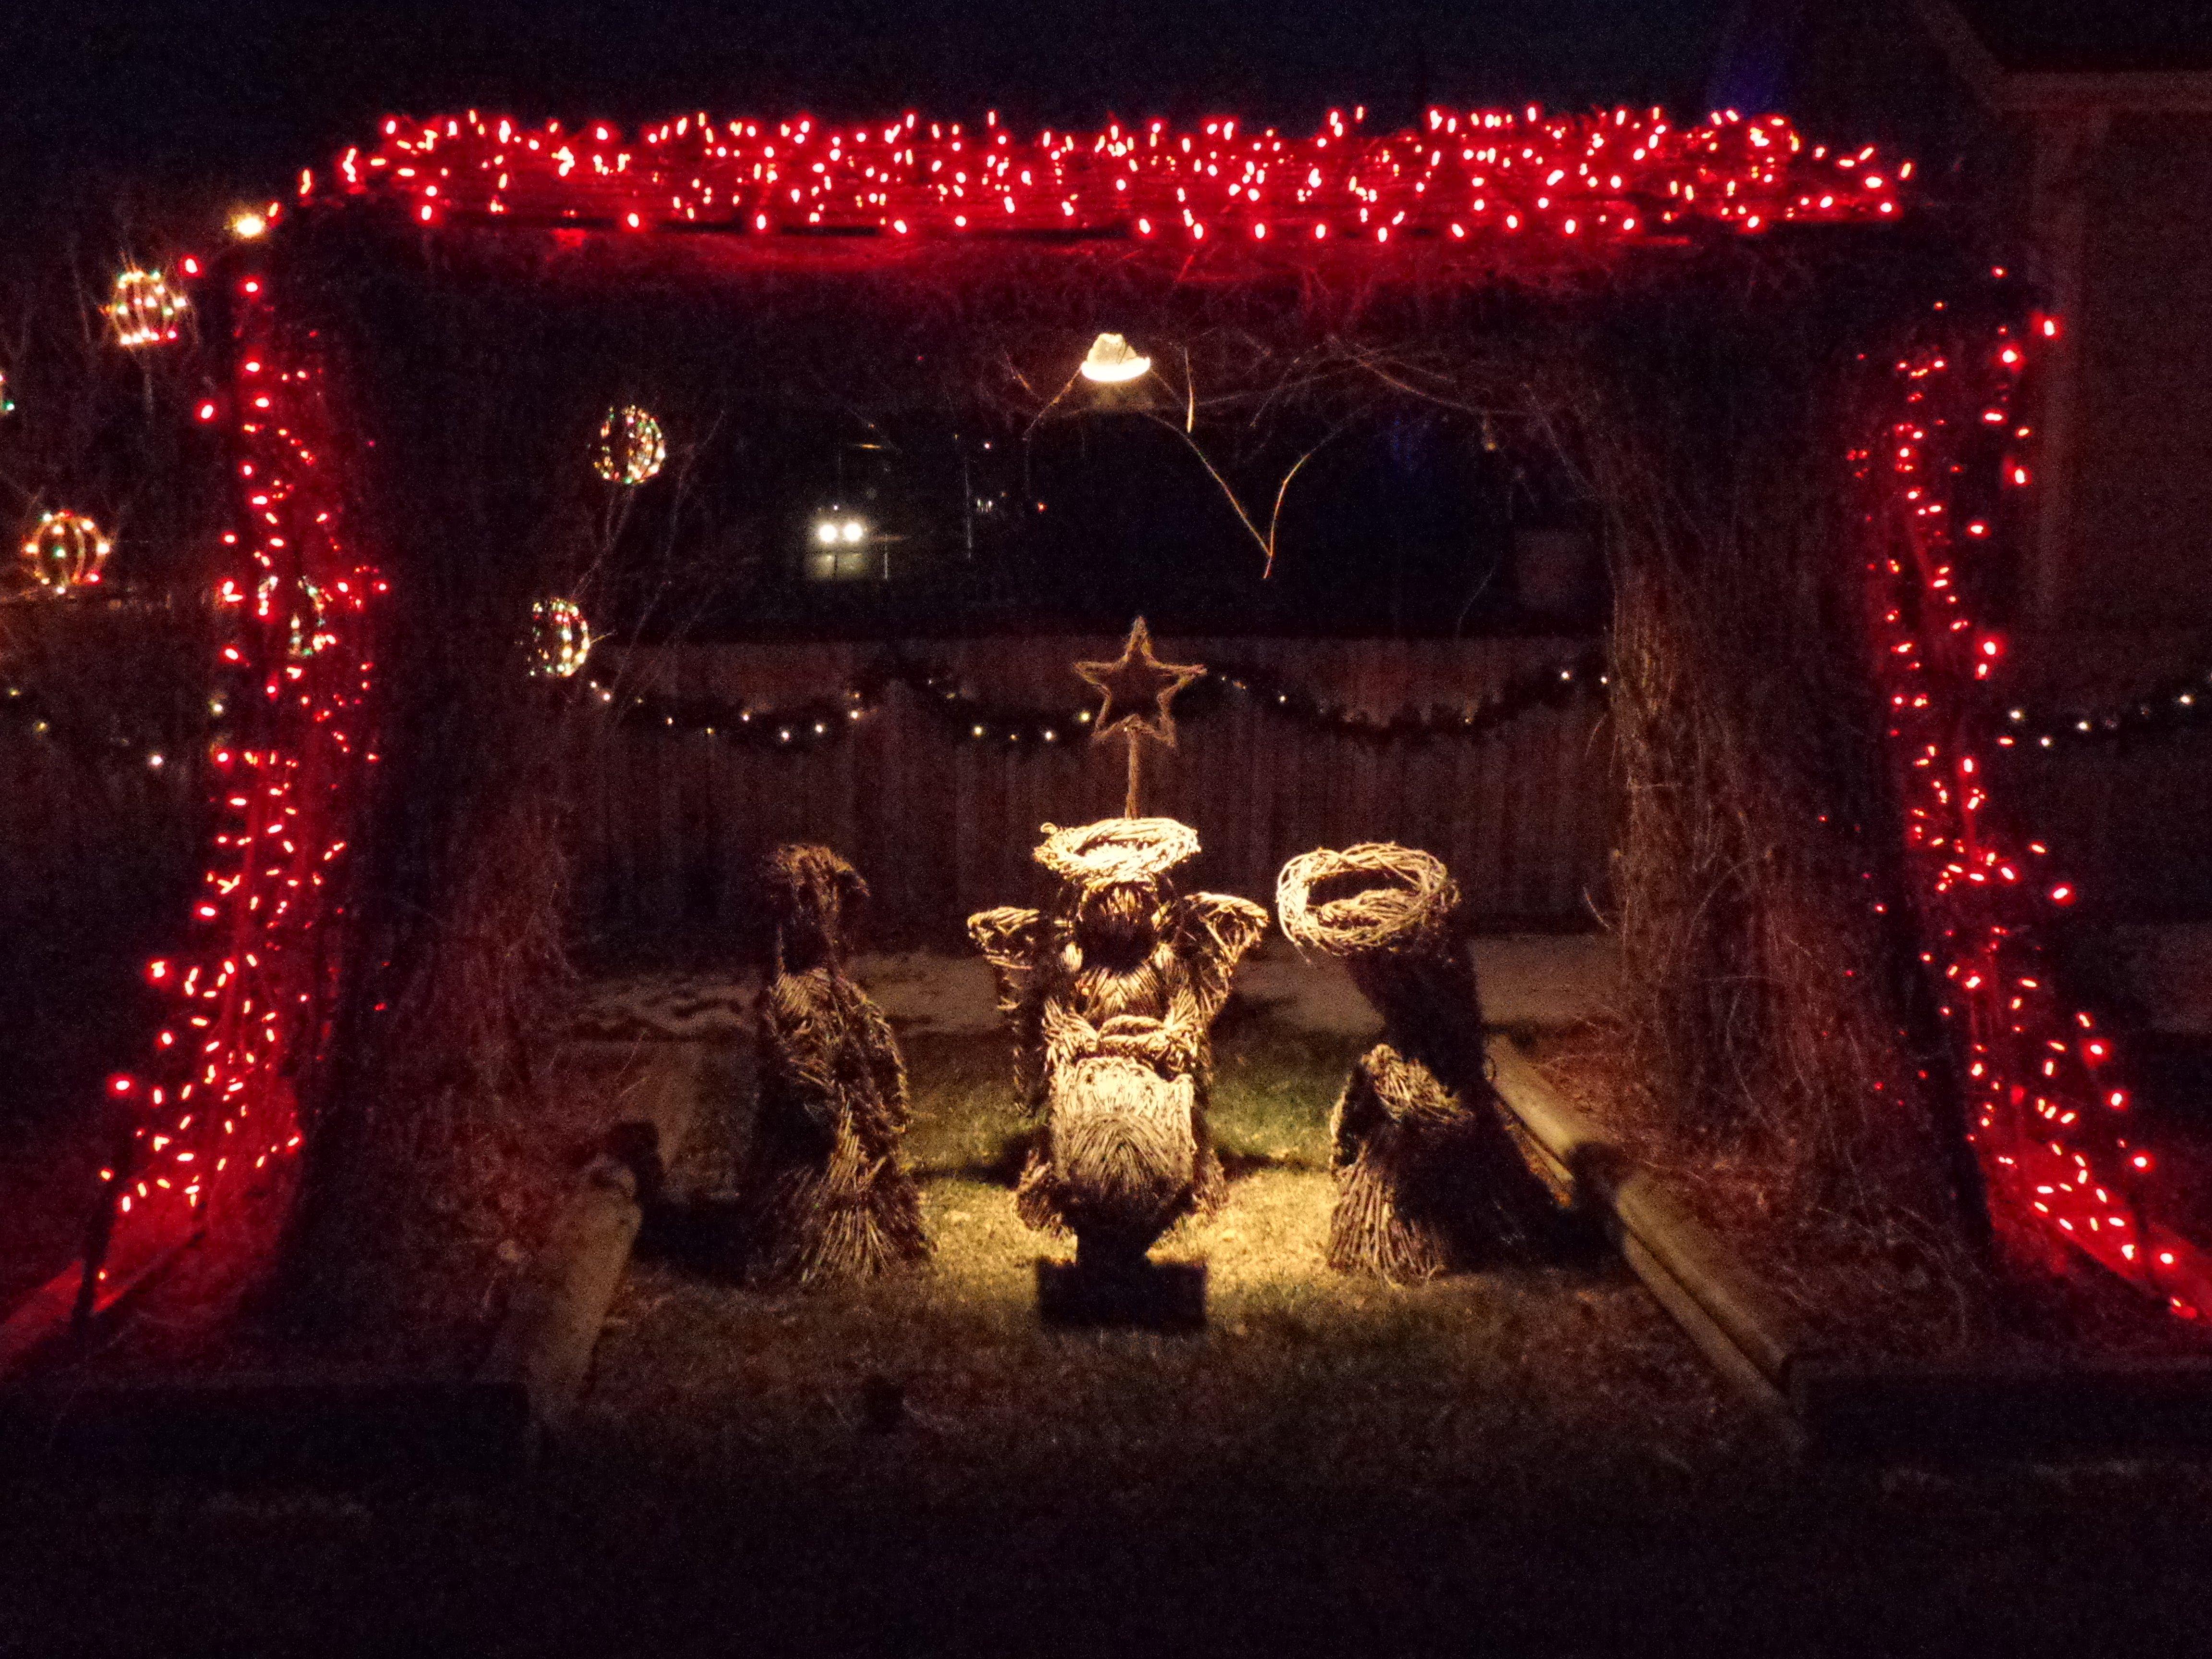 Nativity Scene with Christmas Lights - Free High Resolution Photo ...